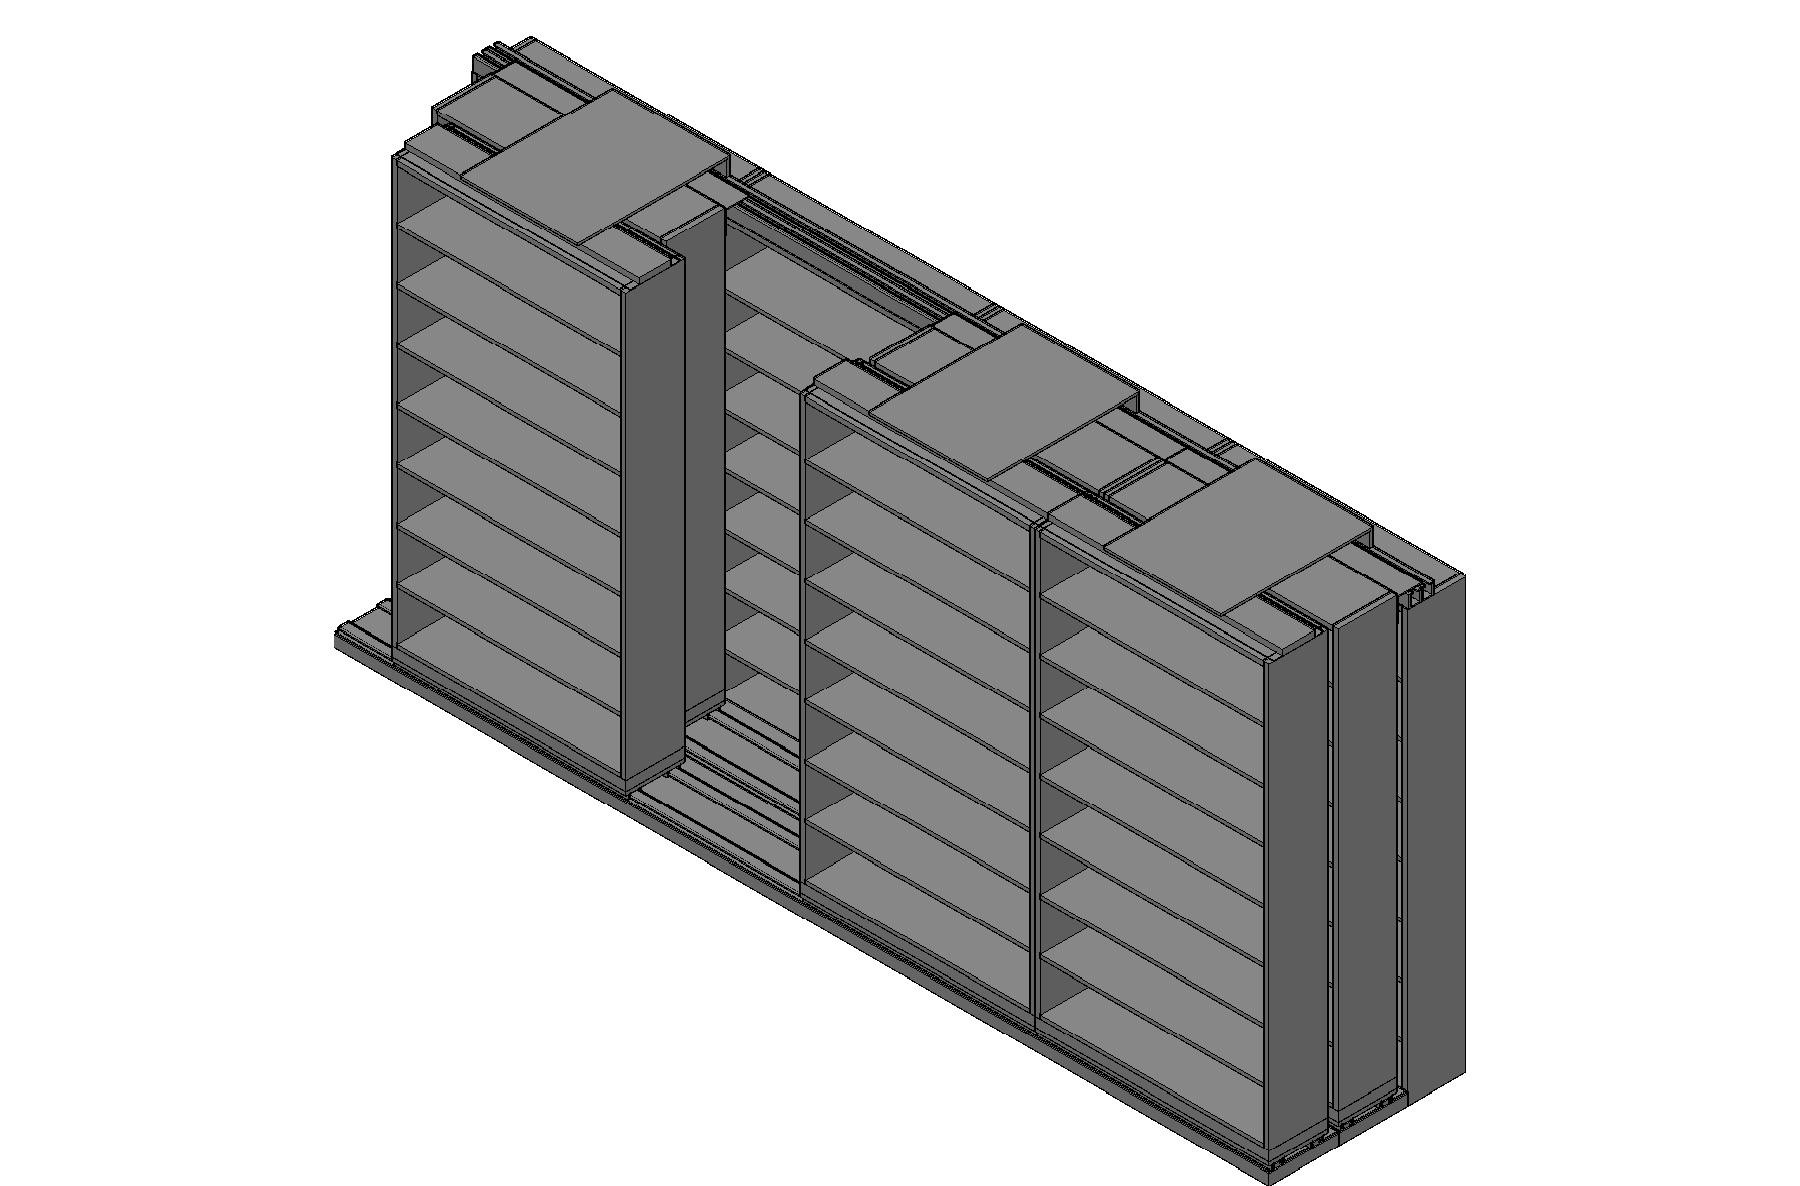 "Letter Size Sliding Shelves - 3 Rows Deep - 8 Levels - (48"" x 12"" Shelves) - 196"" Total Width"